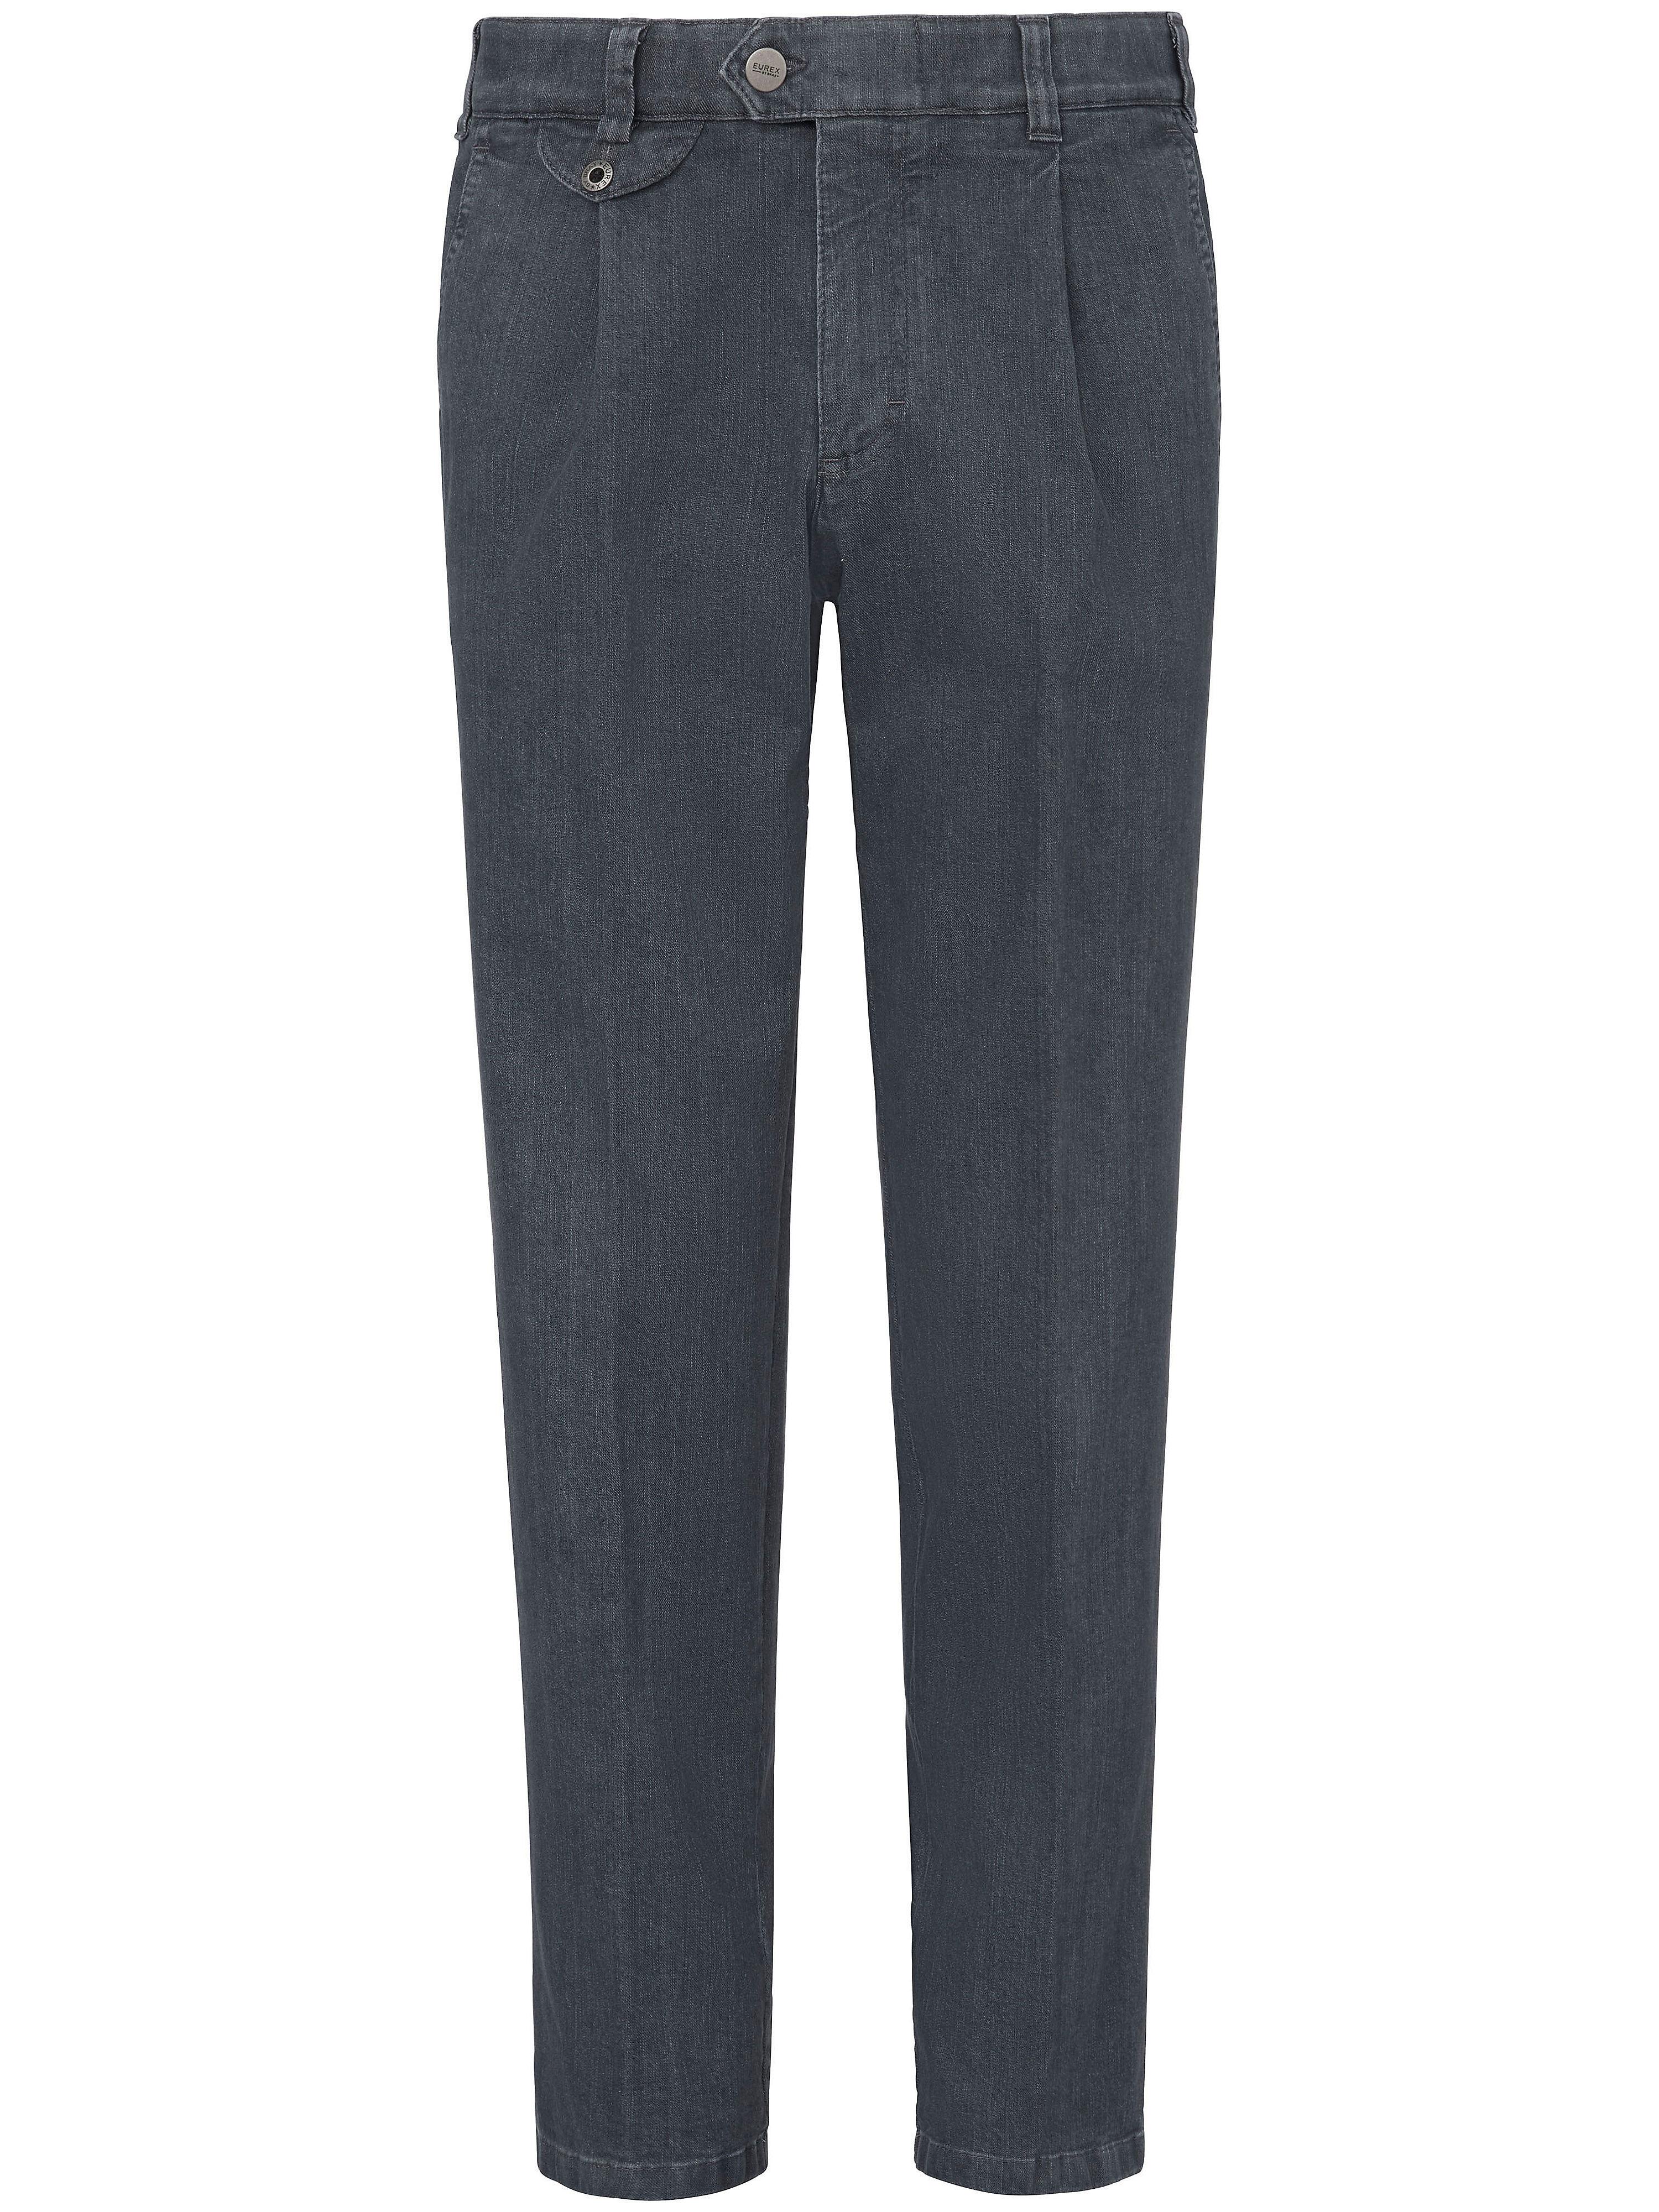 Bandplooi-jeans Van Eurex by Brax grijs